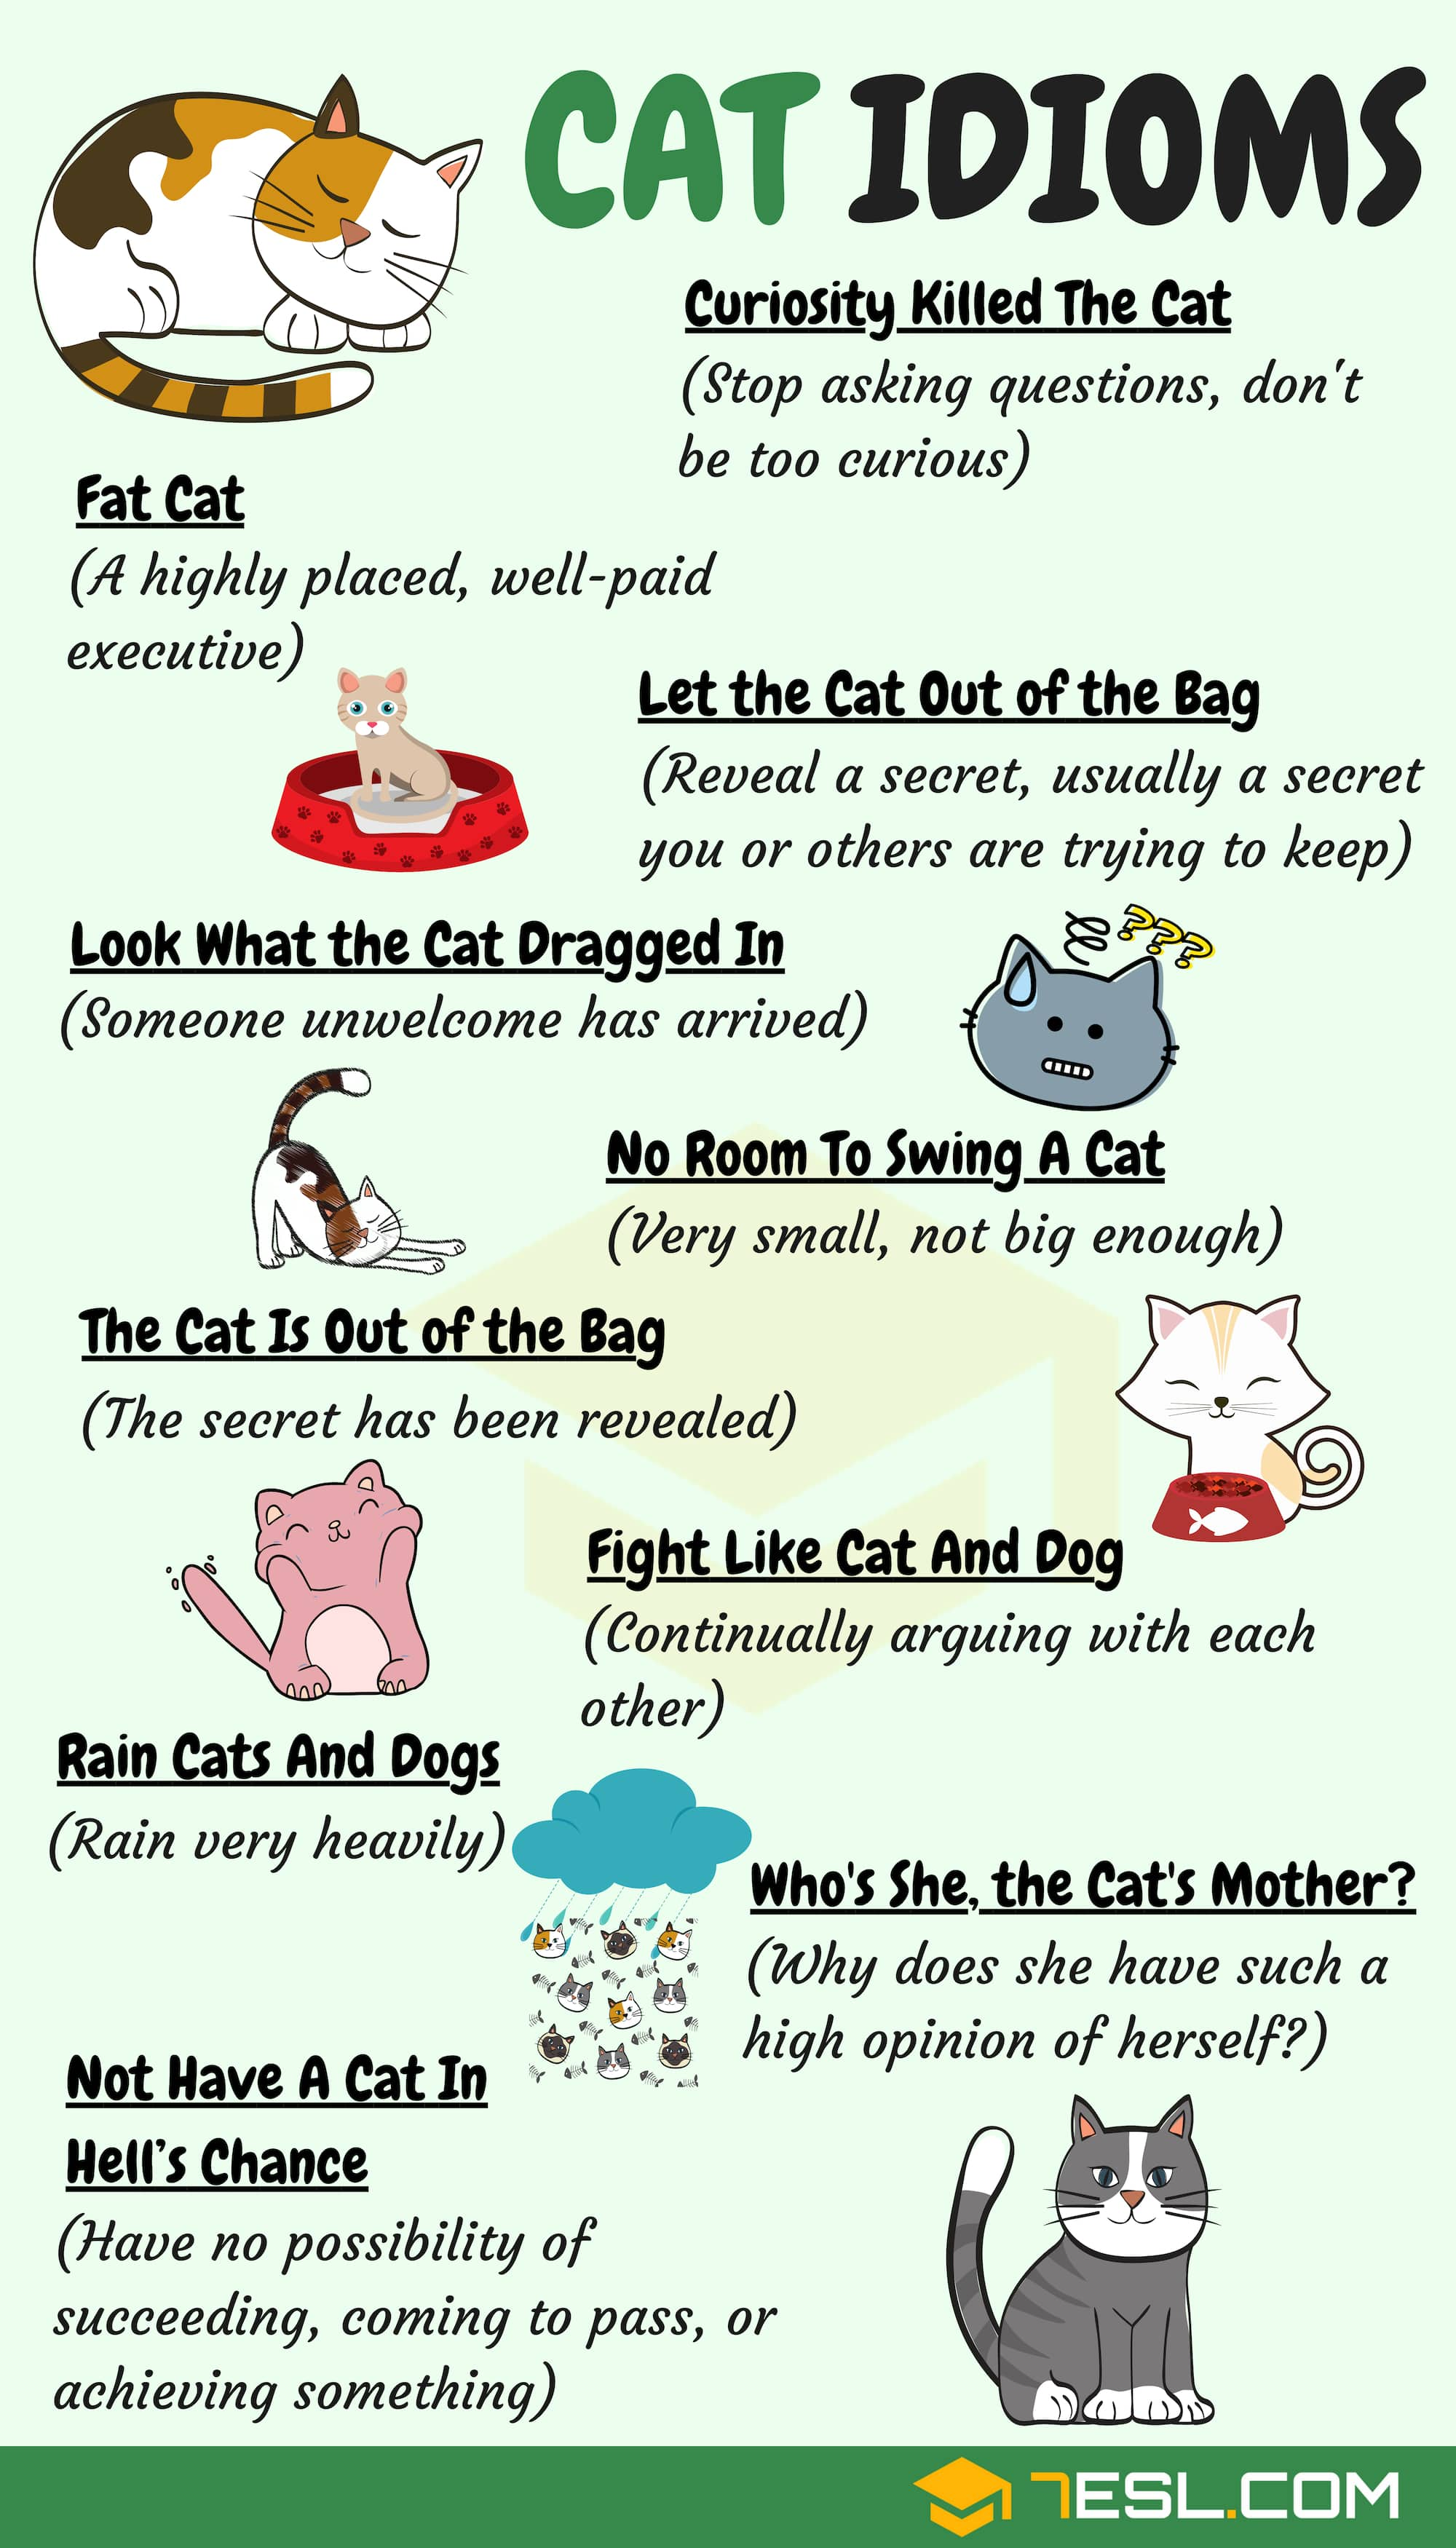 Animal Idioms: 165 Useful Animal Idioms from A-Z • 7ESL